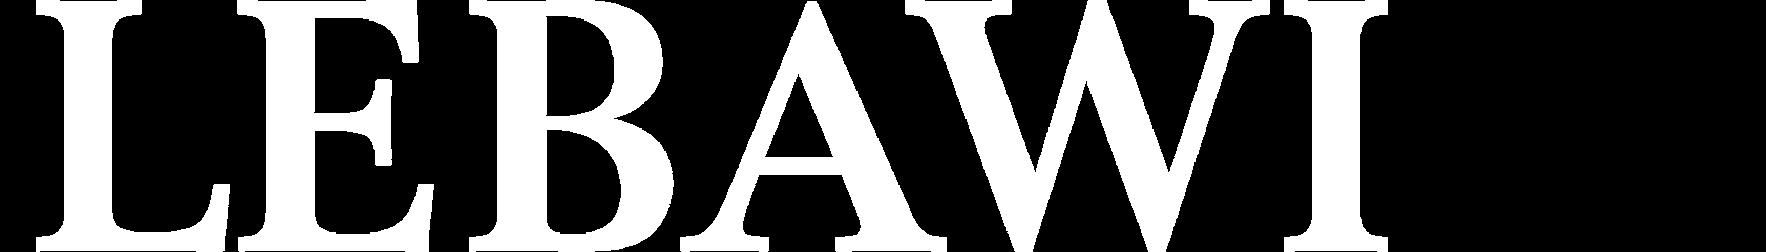 Lebawi